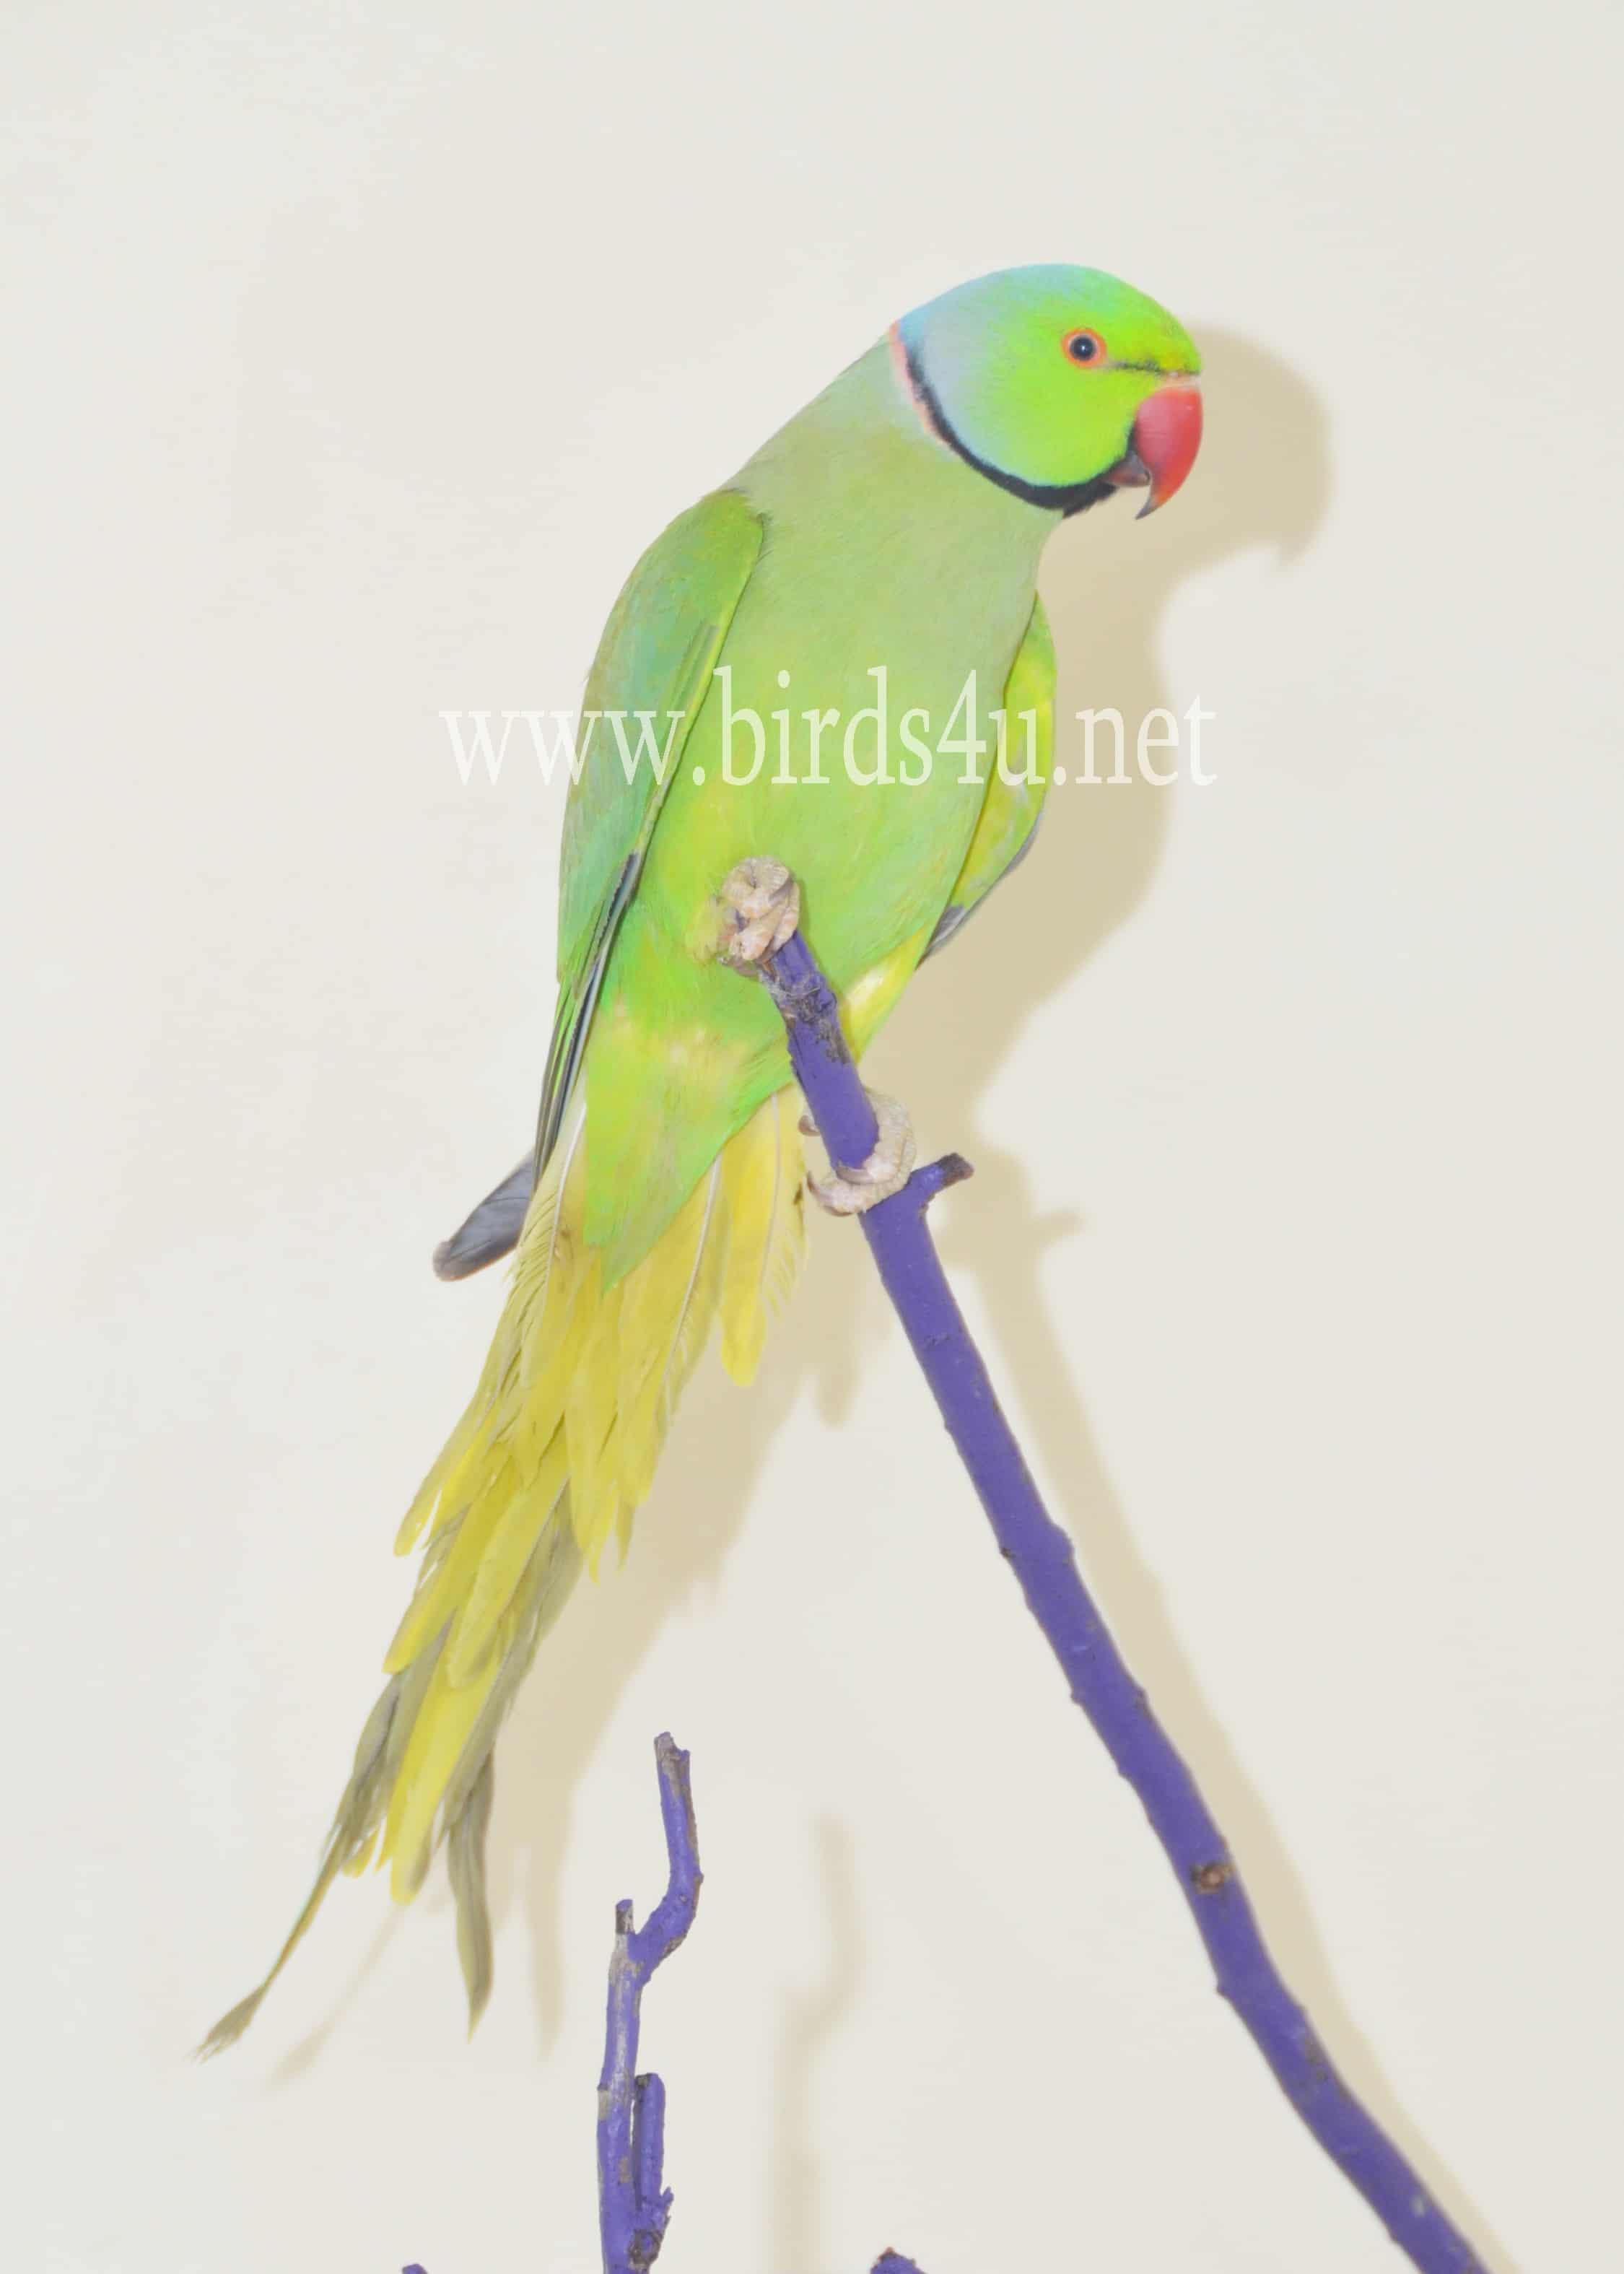 Male Ringneck parrot